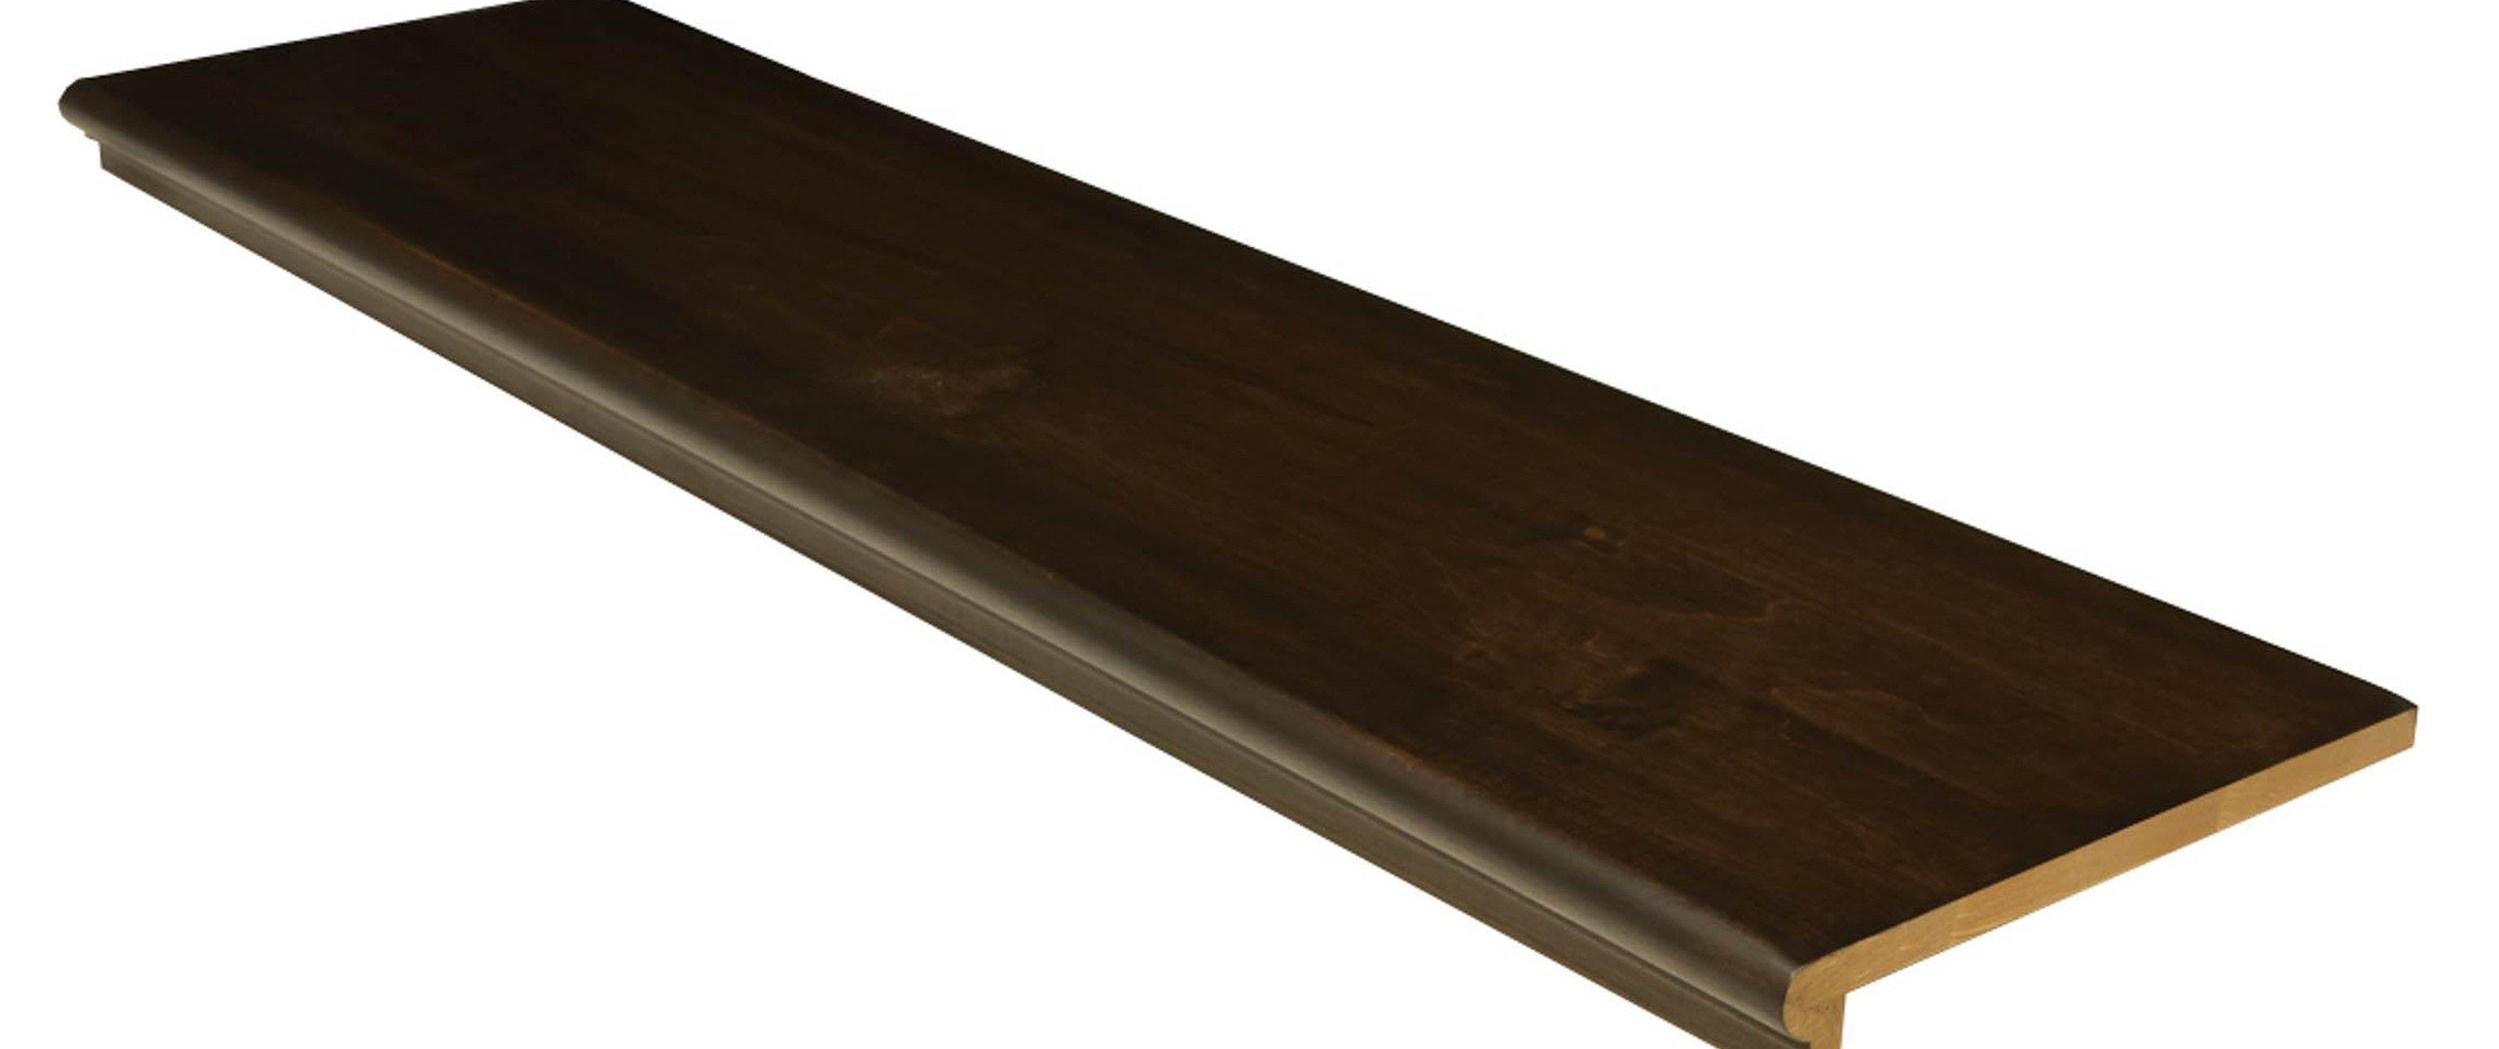 Espresso Birch Boxed Retro Tread 42In 100411214 Floor And Decor | African Mahogany Stair Treads | Handrail | Cutting Board | Plank | Oak | Mahogany Wood Stair